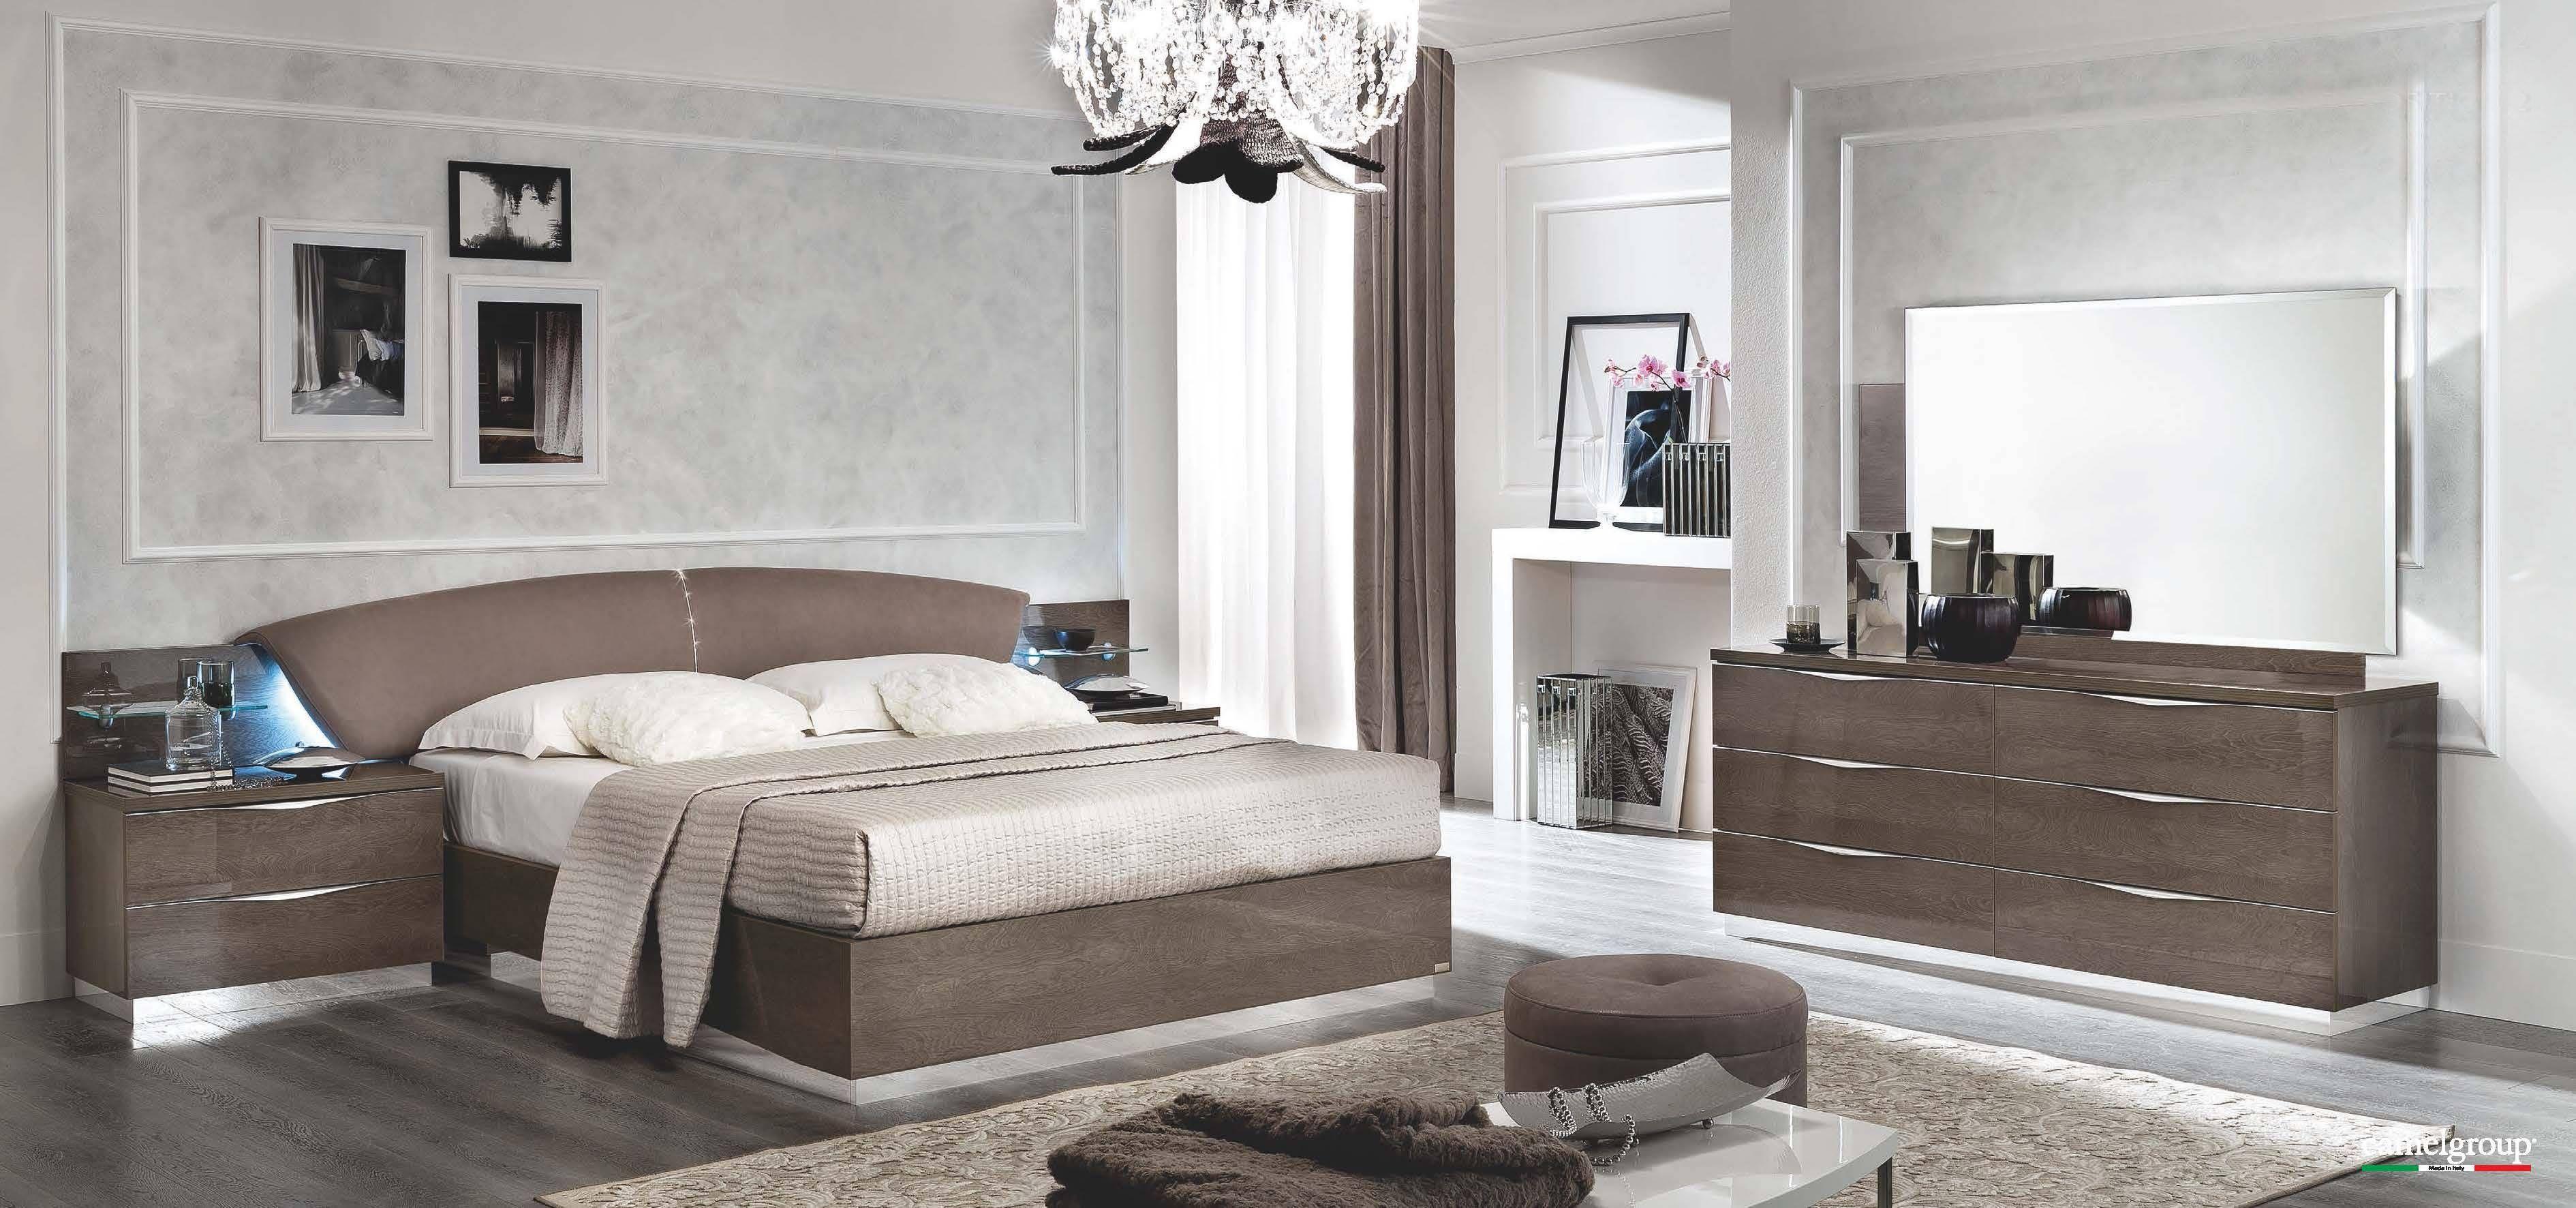 Stylish Italian Silver Birch Walnut Colored Bedroom Set This Is A Modern